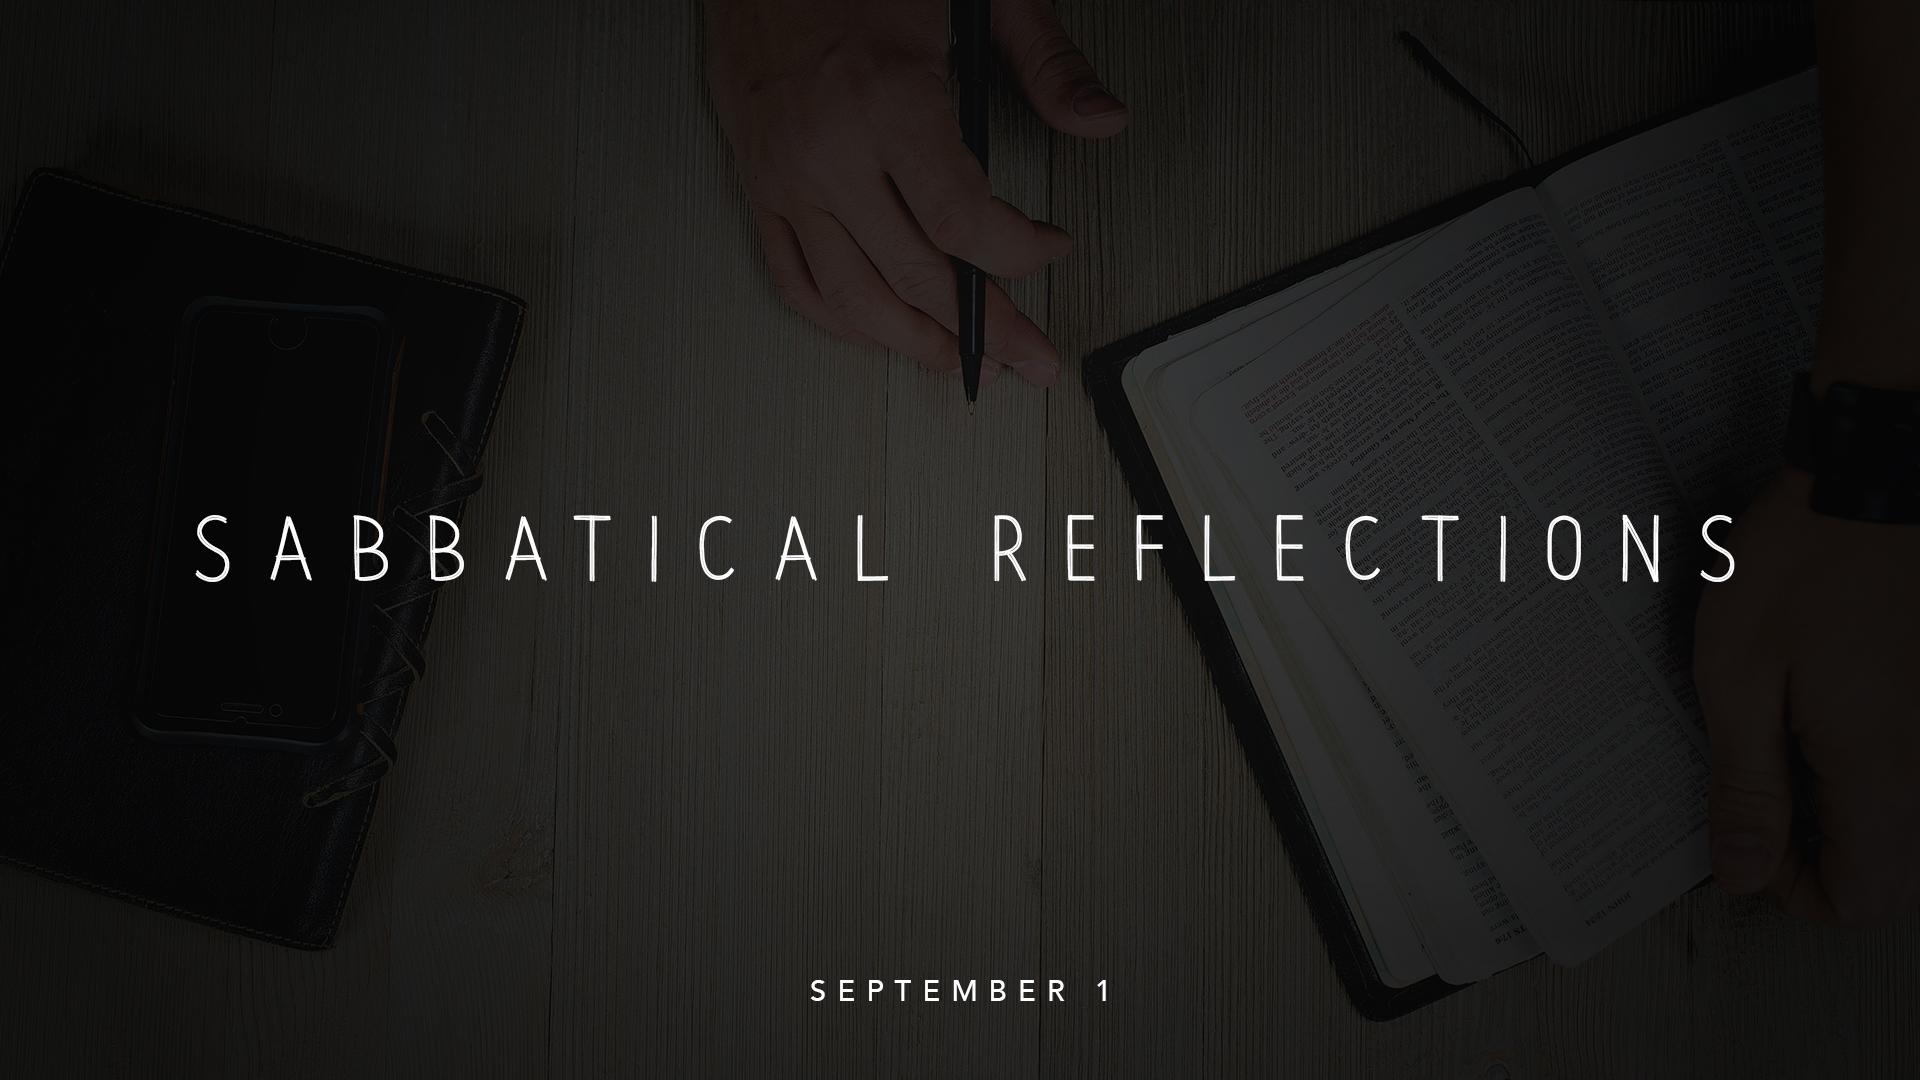 SabbaticalReflections-V2-b.jpg